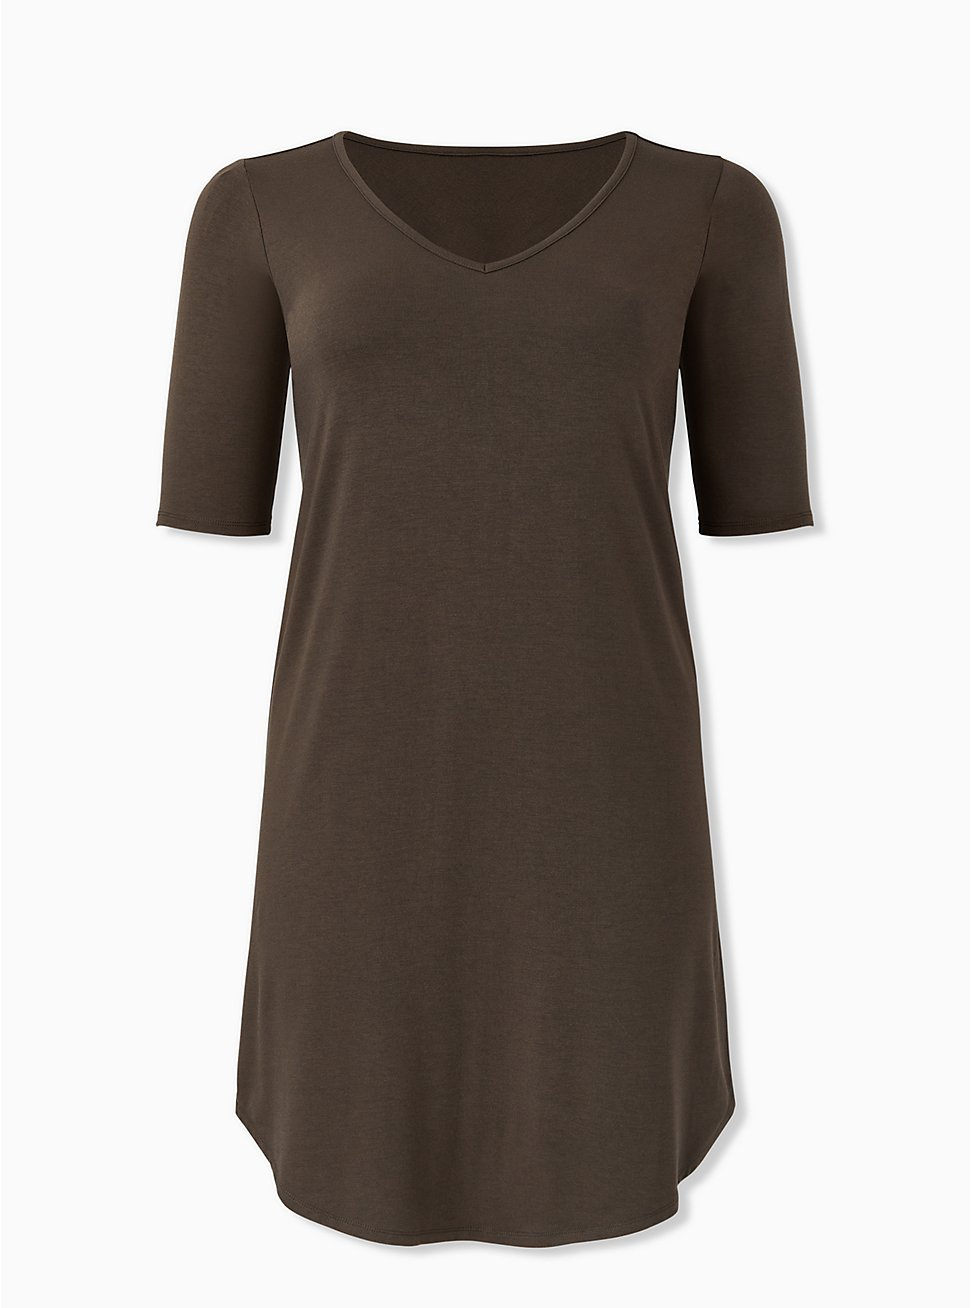 Plus Size Olive Green Jersey T-Shirt Dress, DEEP DEPTHS, hi-res